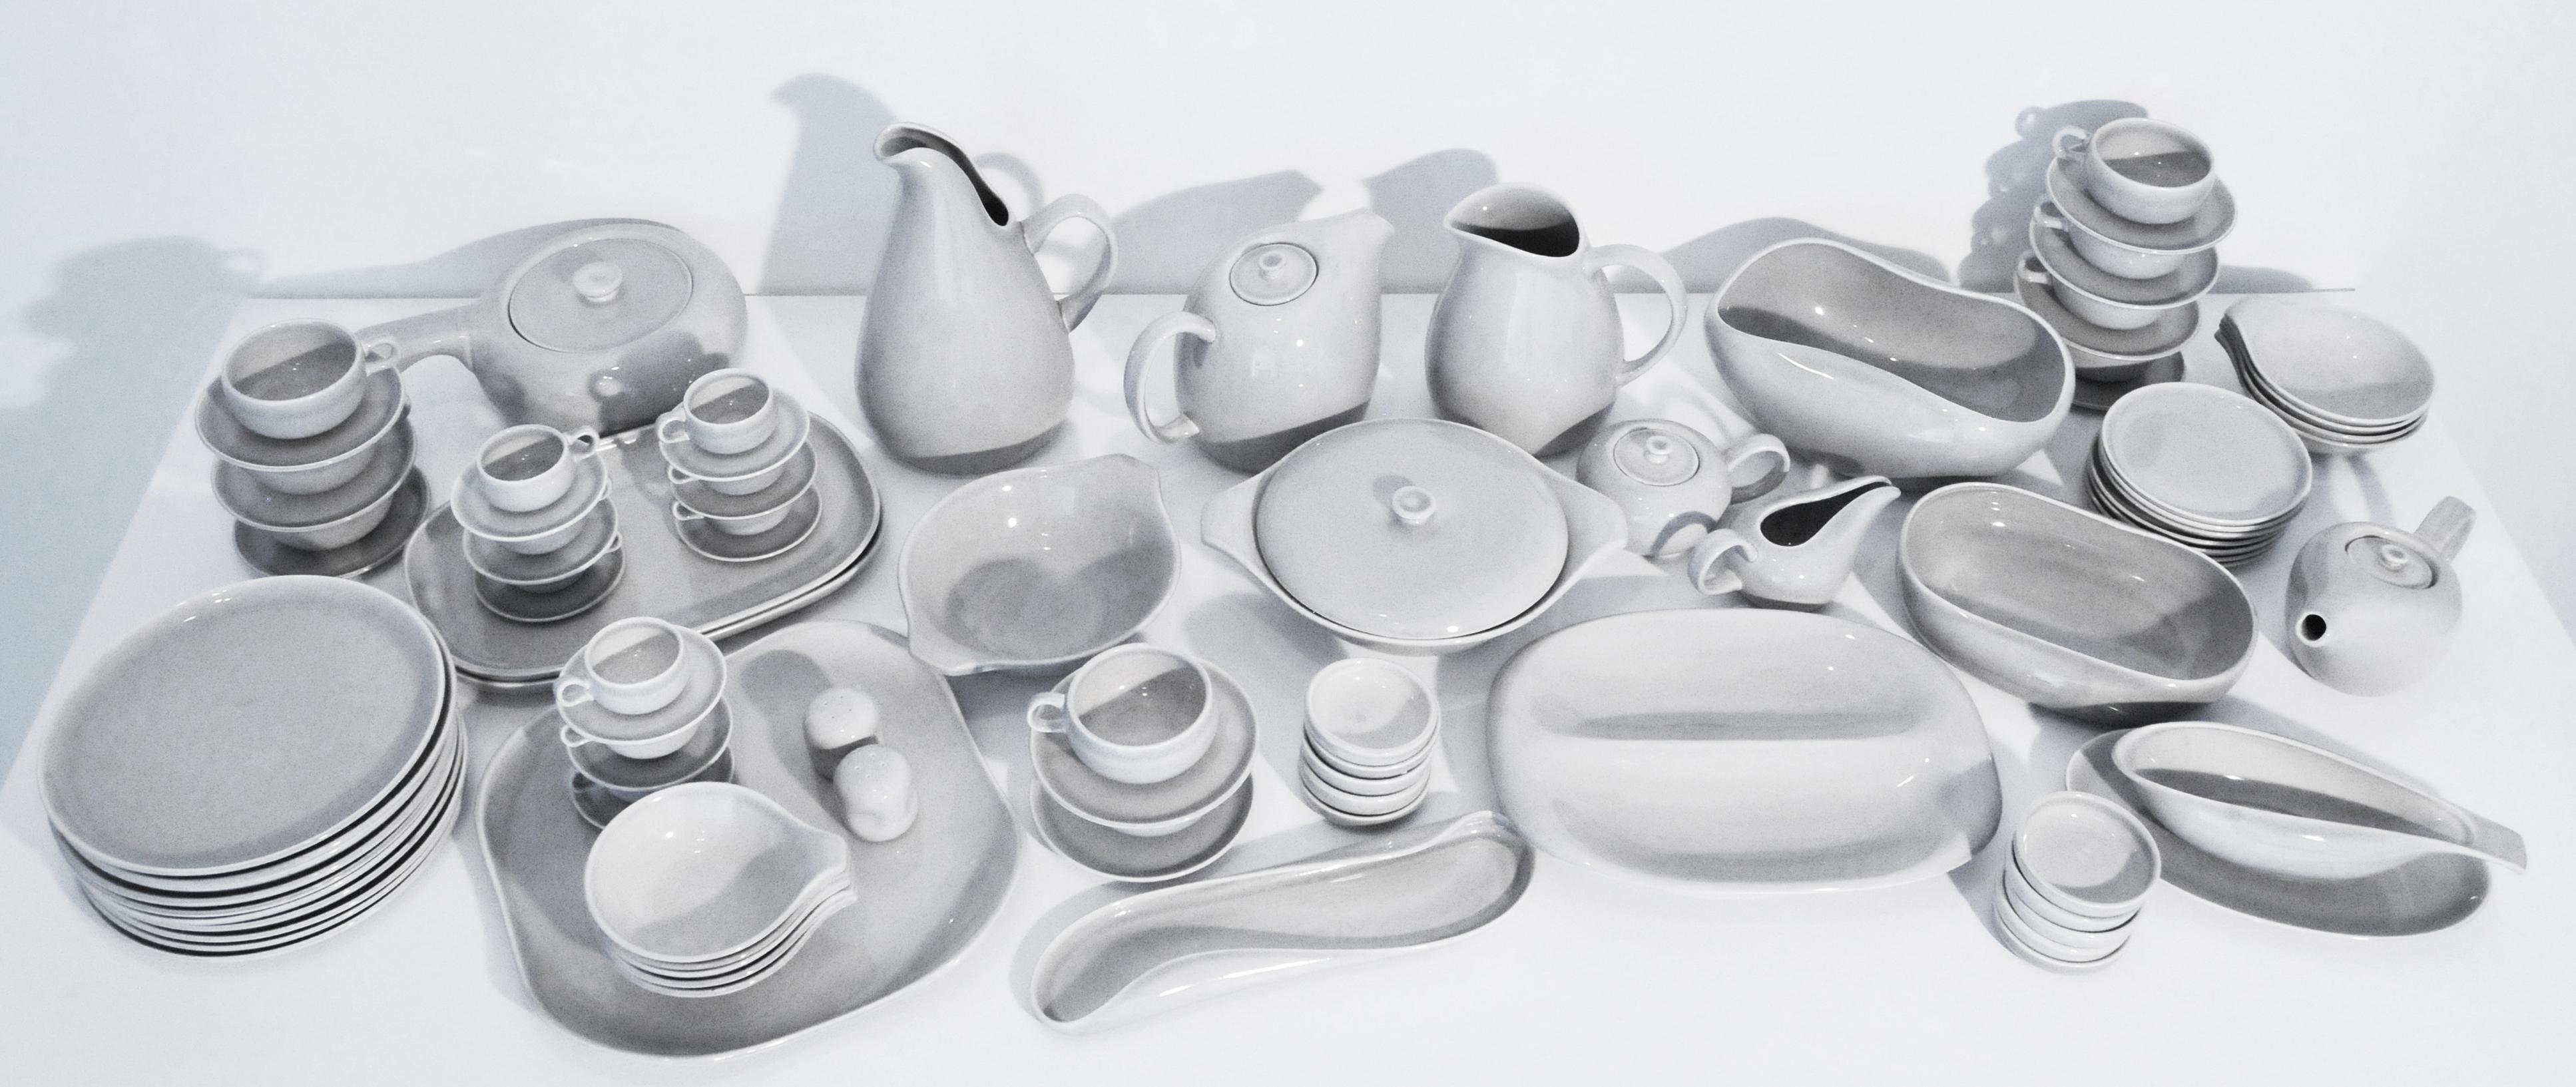 Russel Wright Dishware set in Granite Grey  sc 1 st  Modernist Icon & Russel Wright - American Modern - Granite Grey - Large setting ...